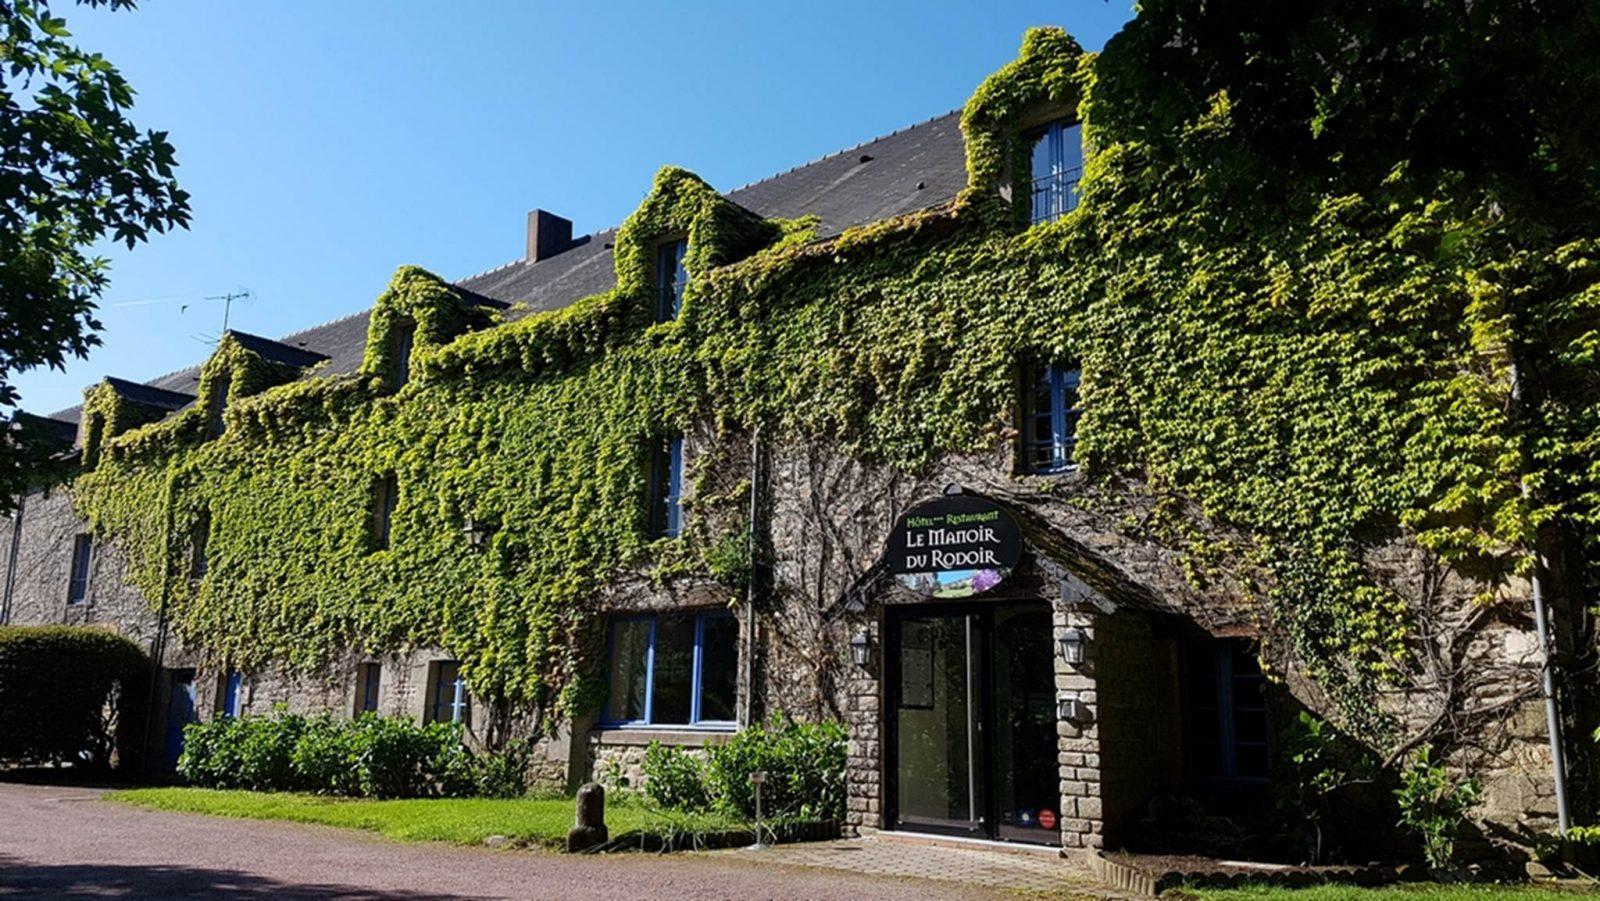 Hotel – Manoir du Rodoir – Nivillac – Tourisme Arc Sud Bretagne